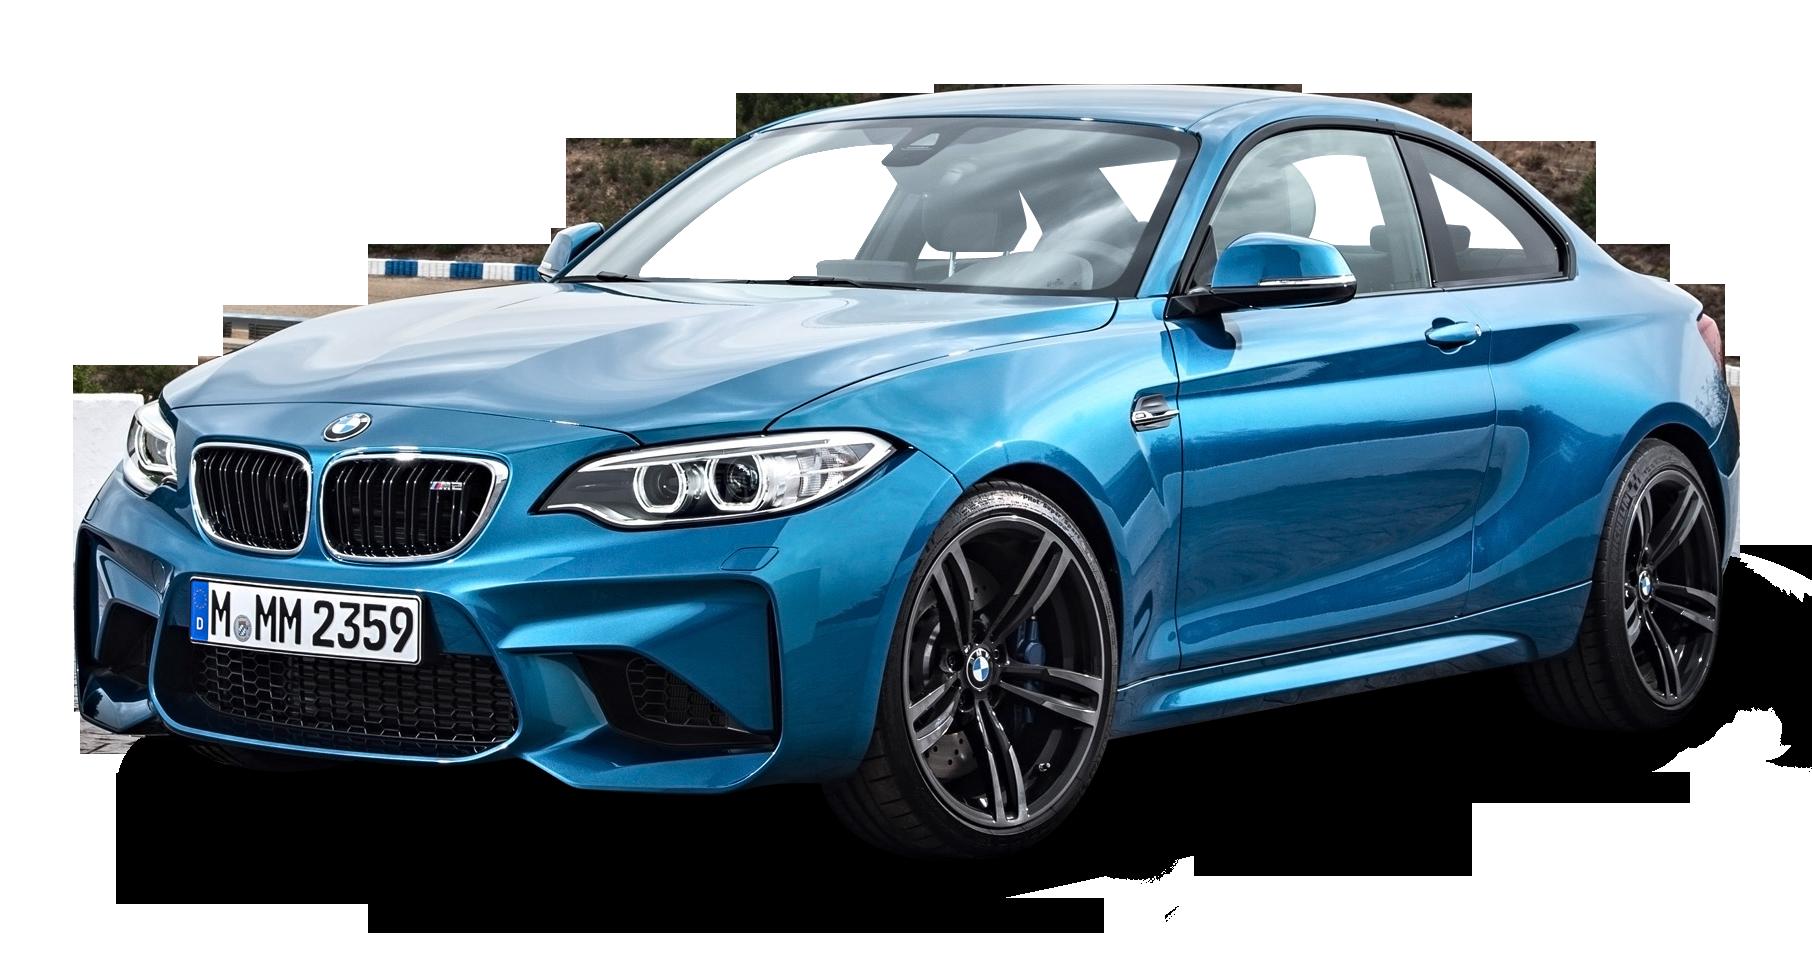 Blue Bmw M2 Coupe Car Png Image Purepng Free Transparent Cc0 Png